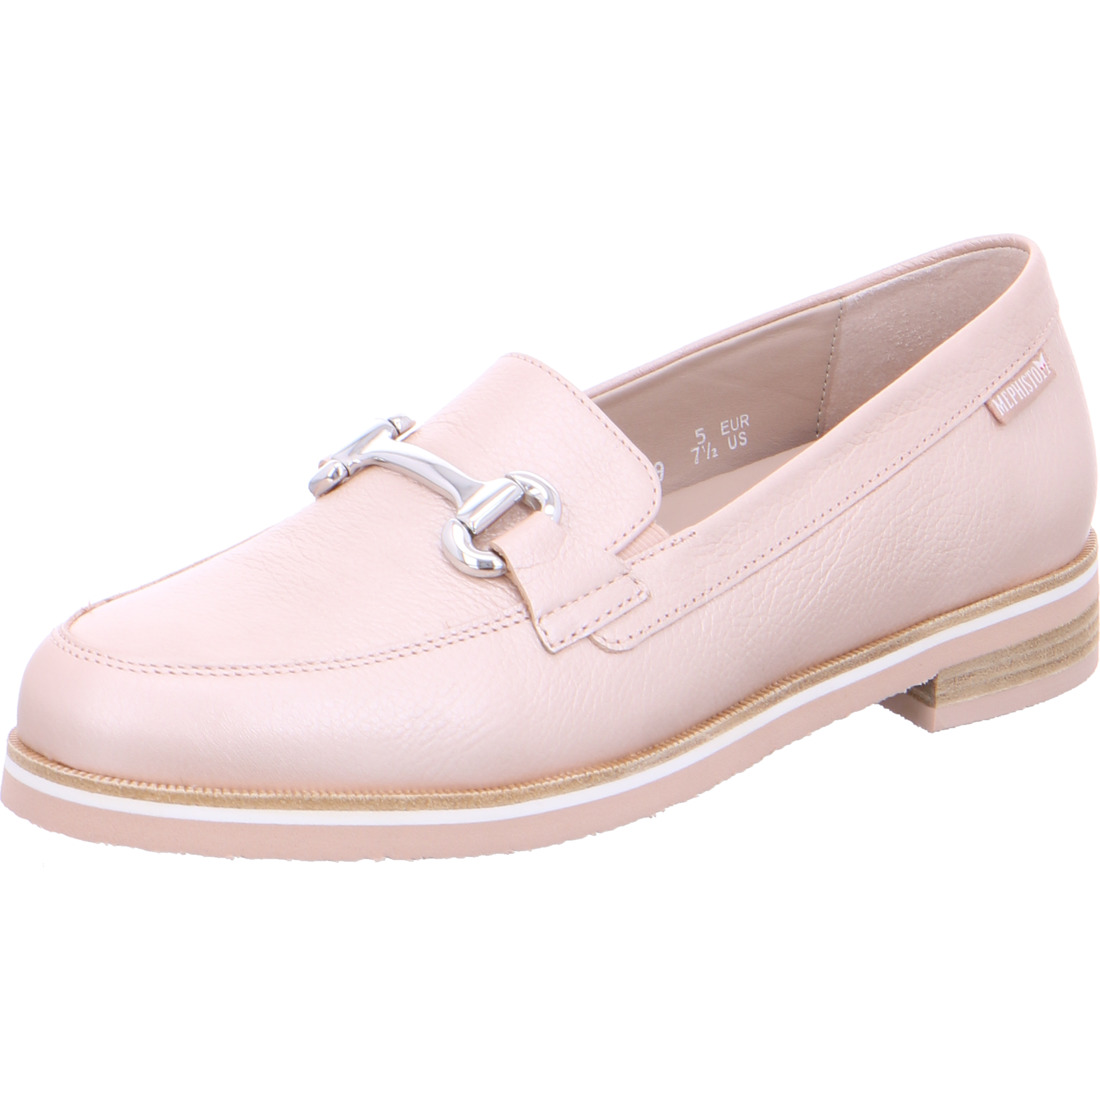 0238d81bb8e897 Mephisto Schuhe im Sale online bestellen